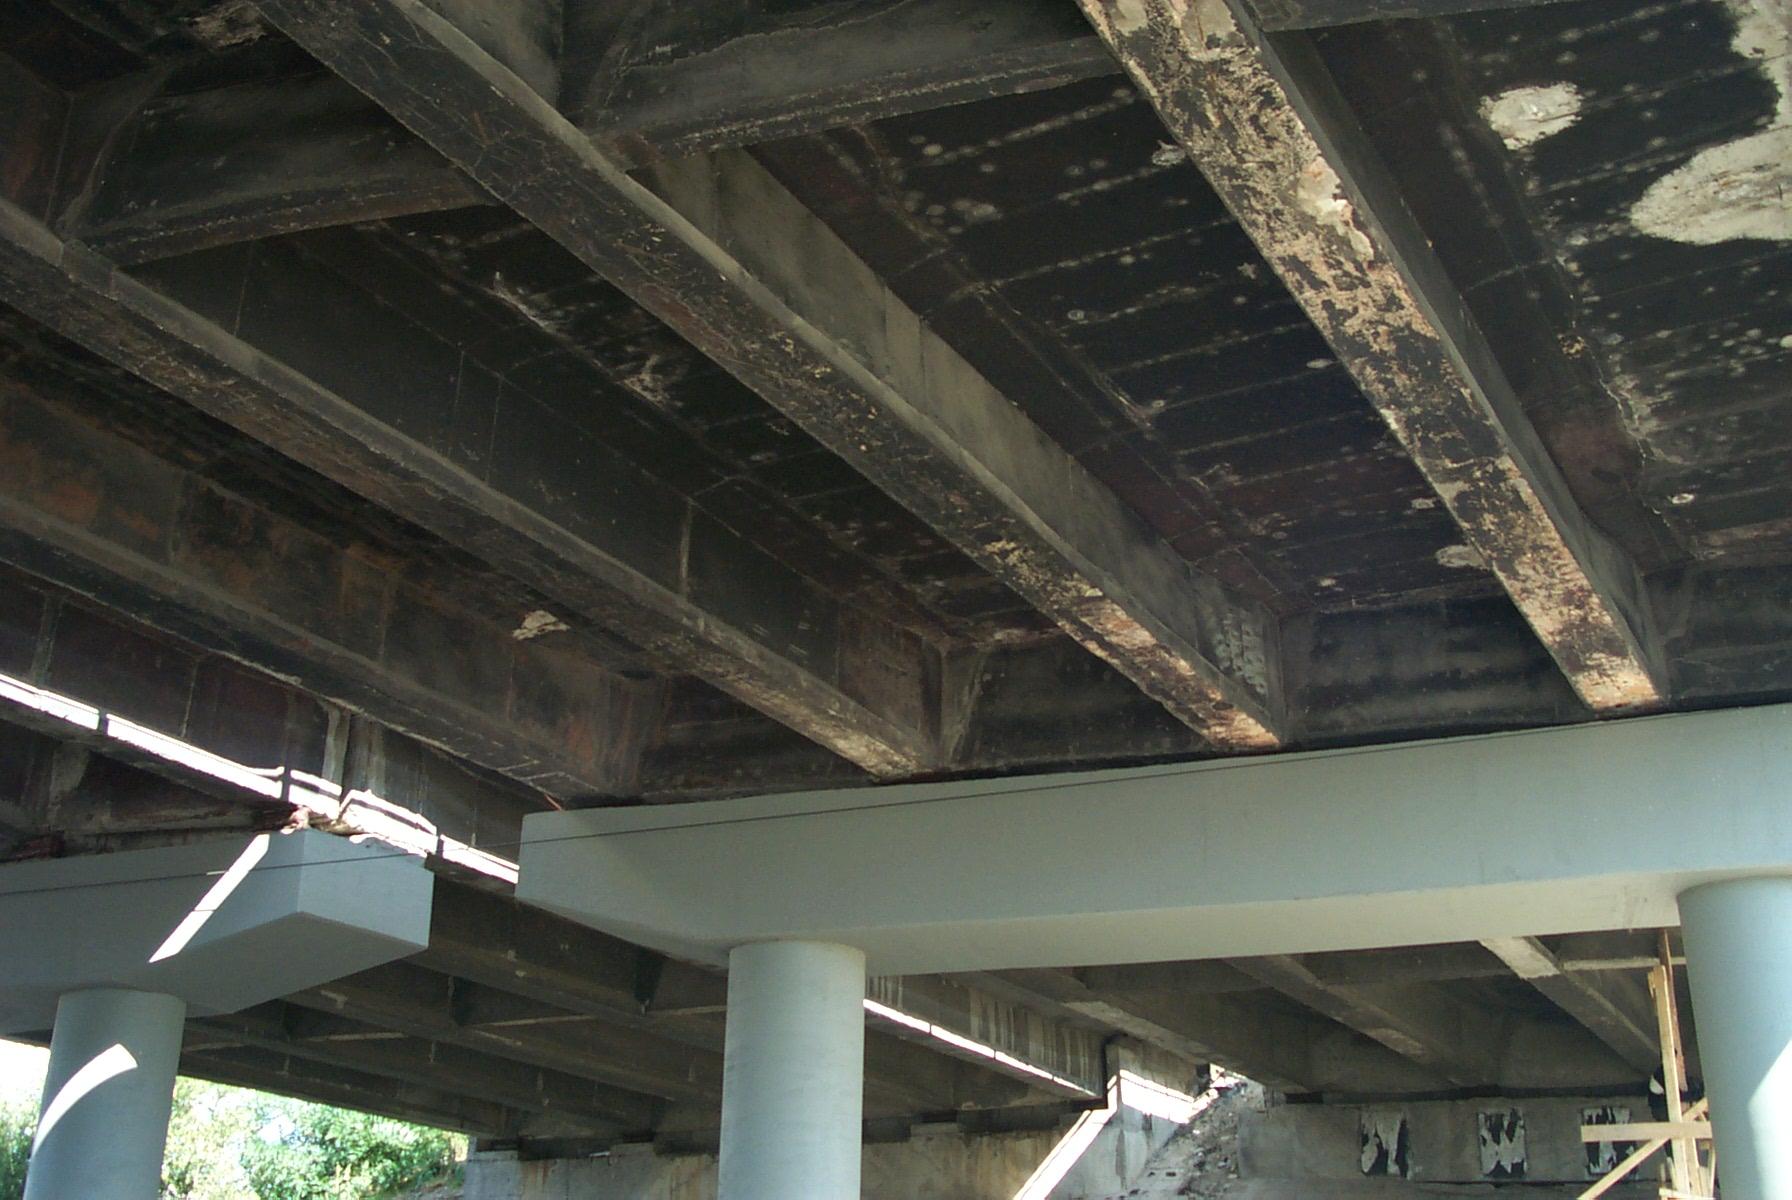 Reparatii pasaje km 11 si 13 pe A1 MAPEI - Poza 27